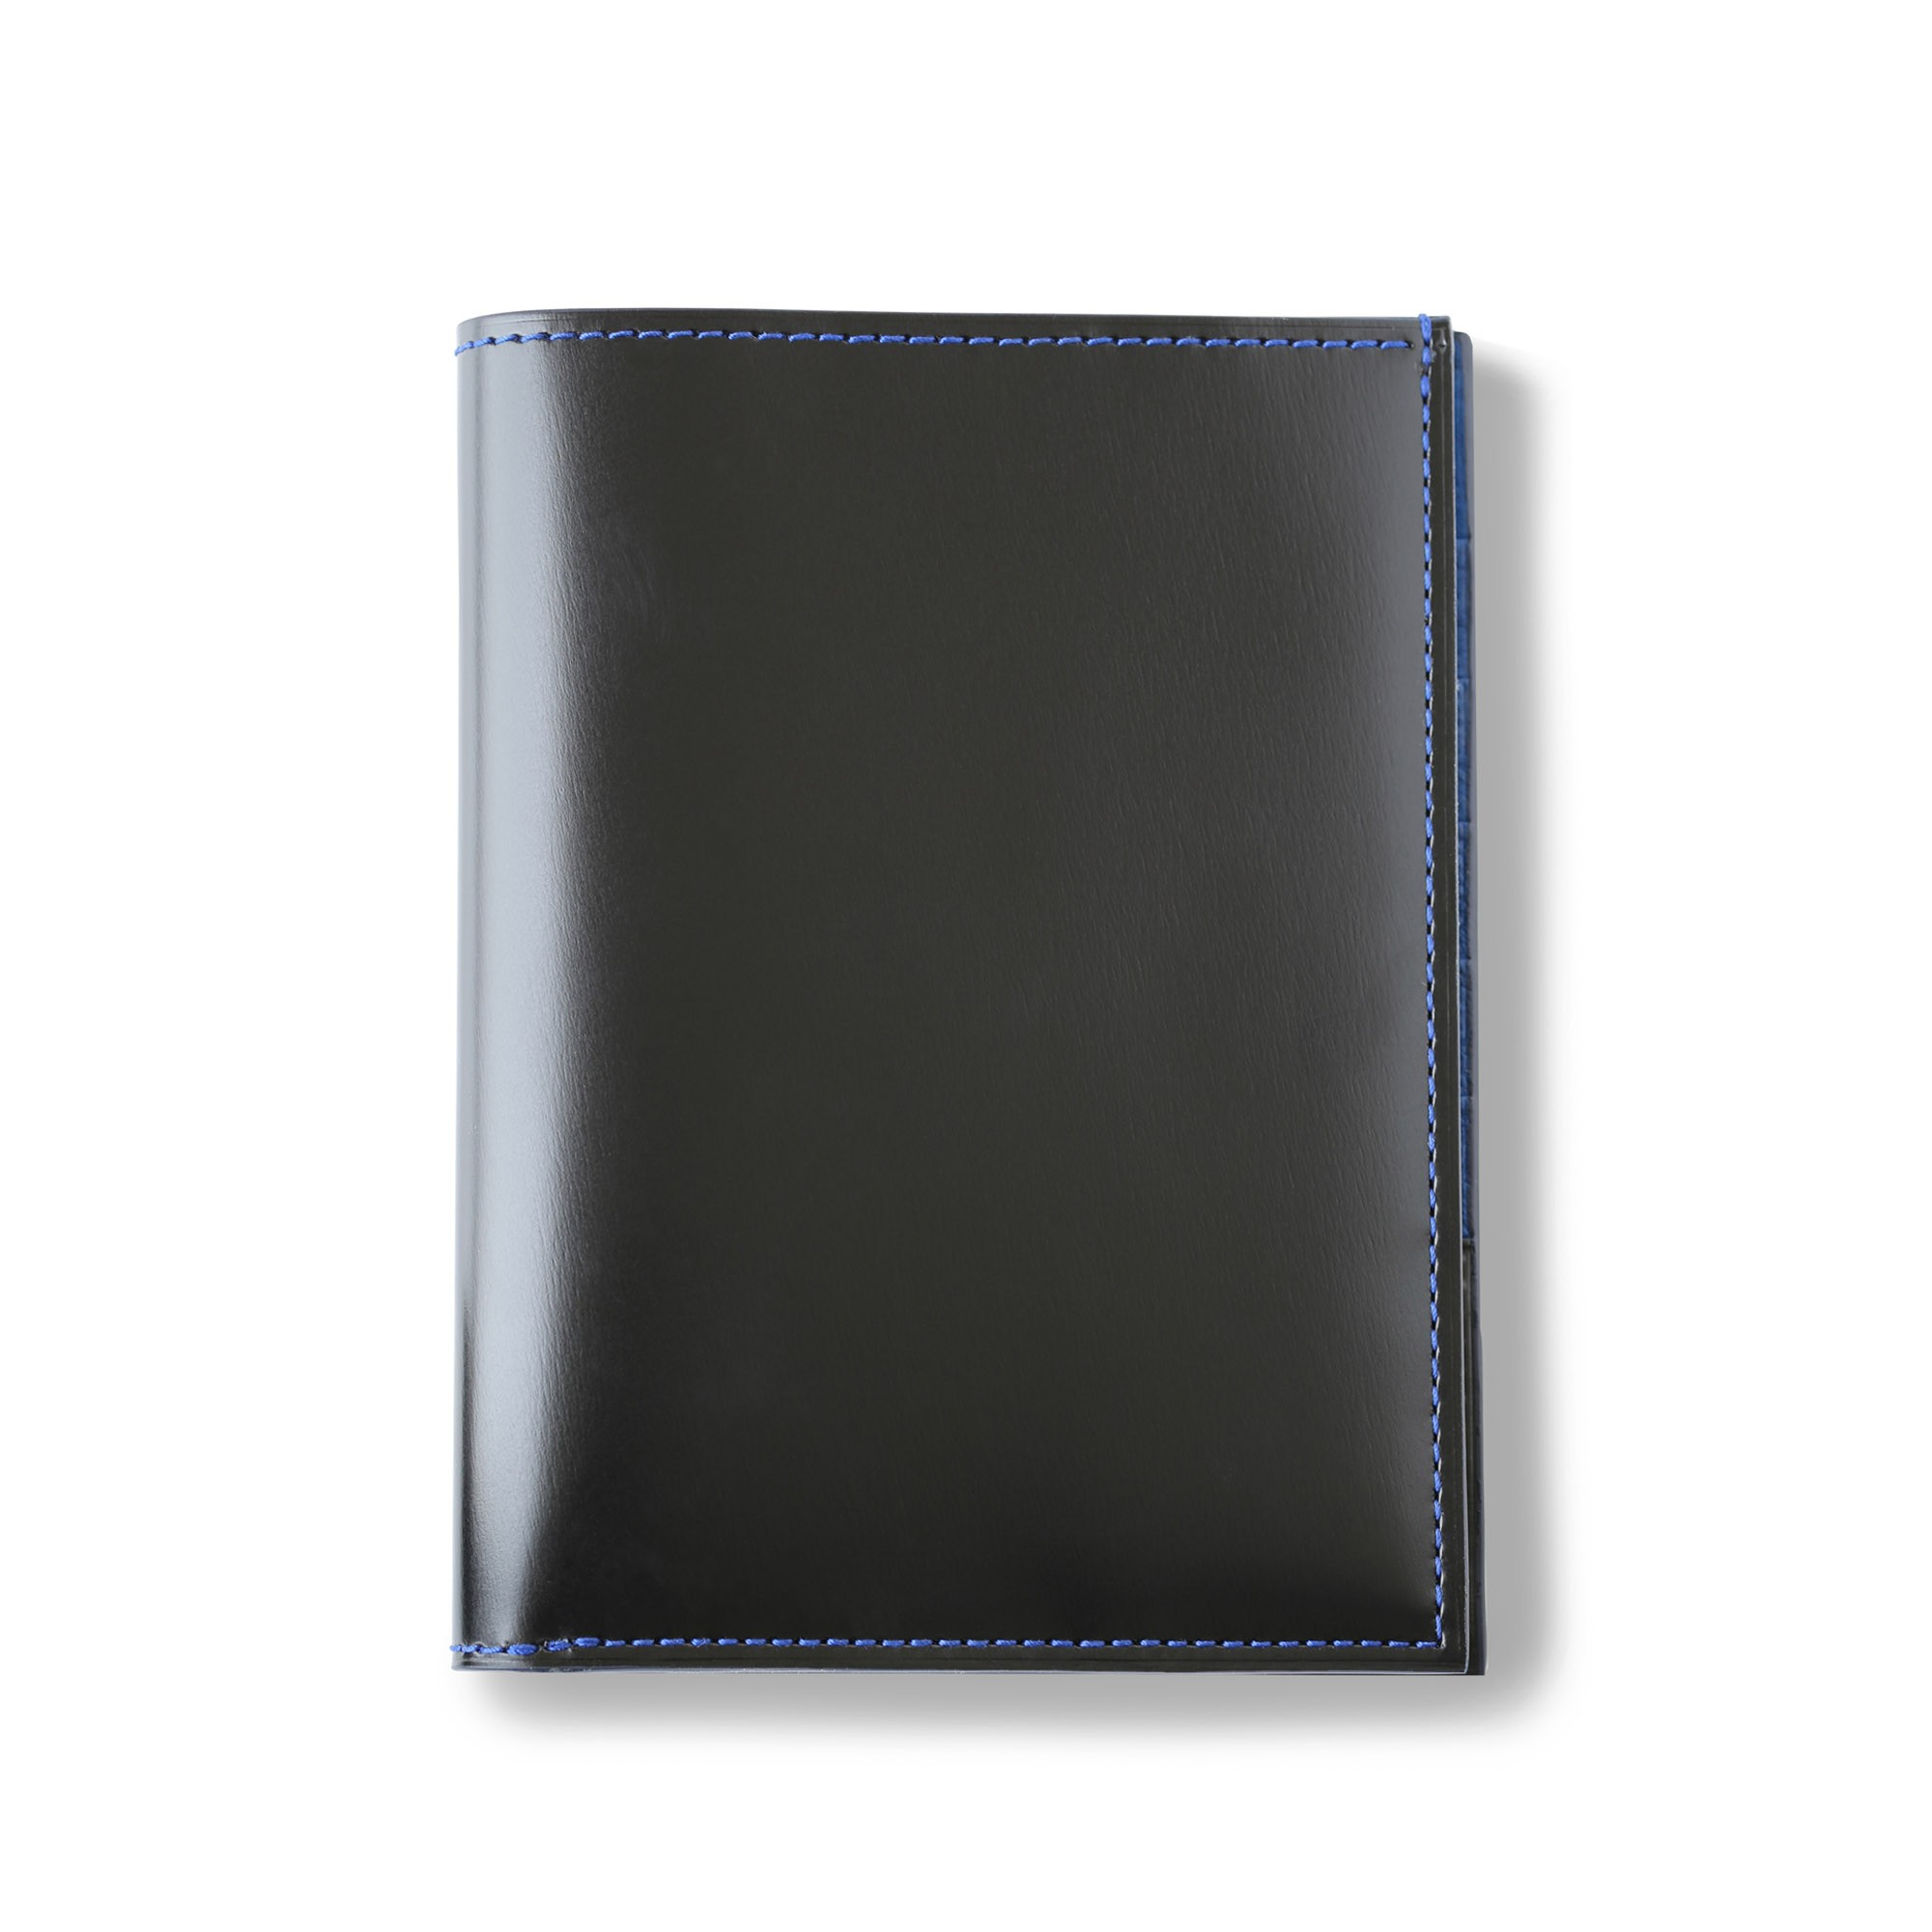 porte-papiers en cuir de box